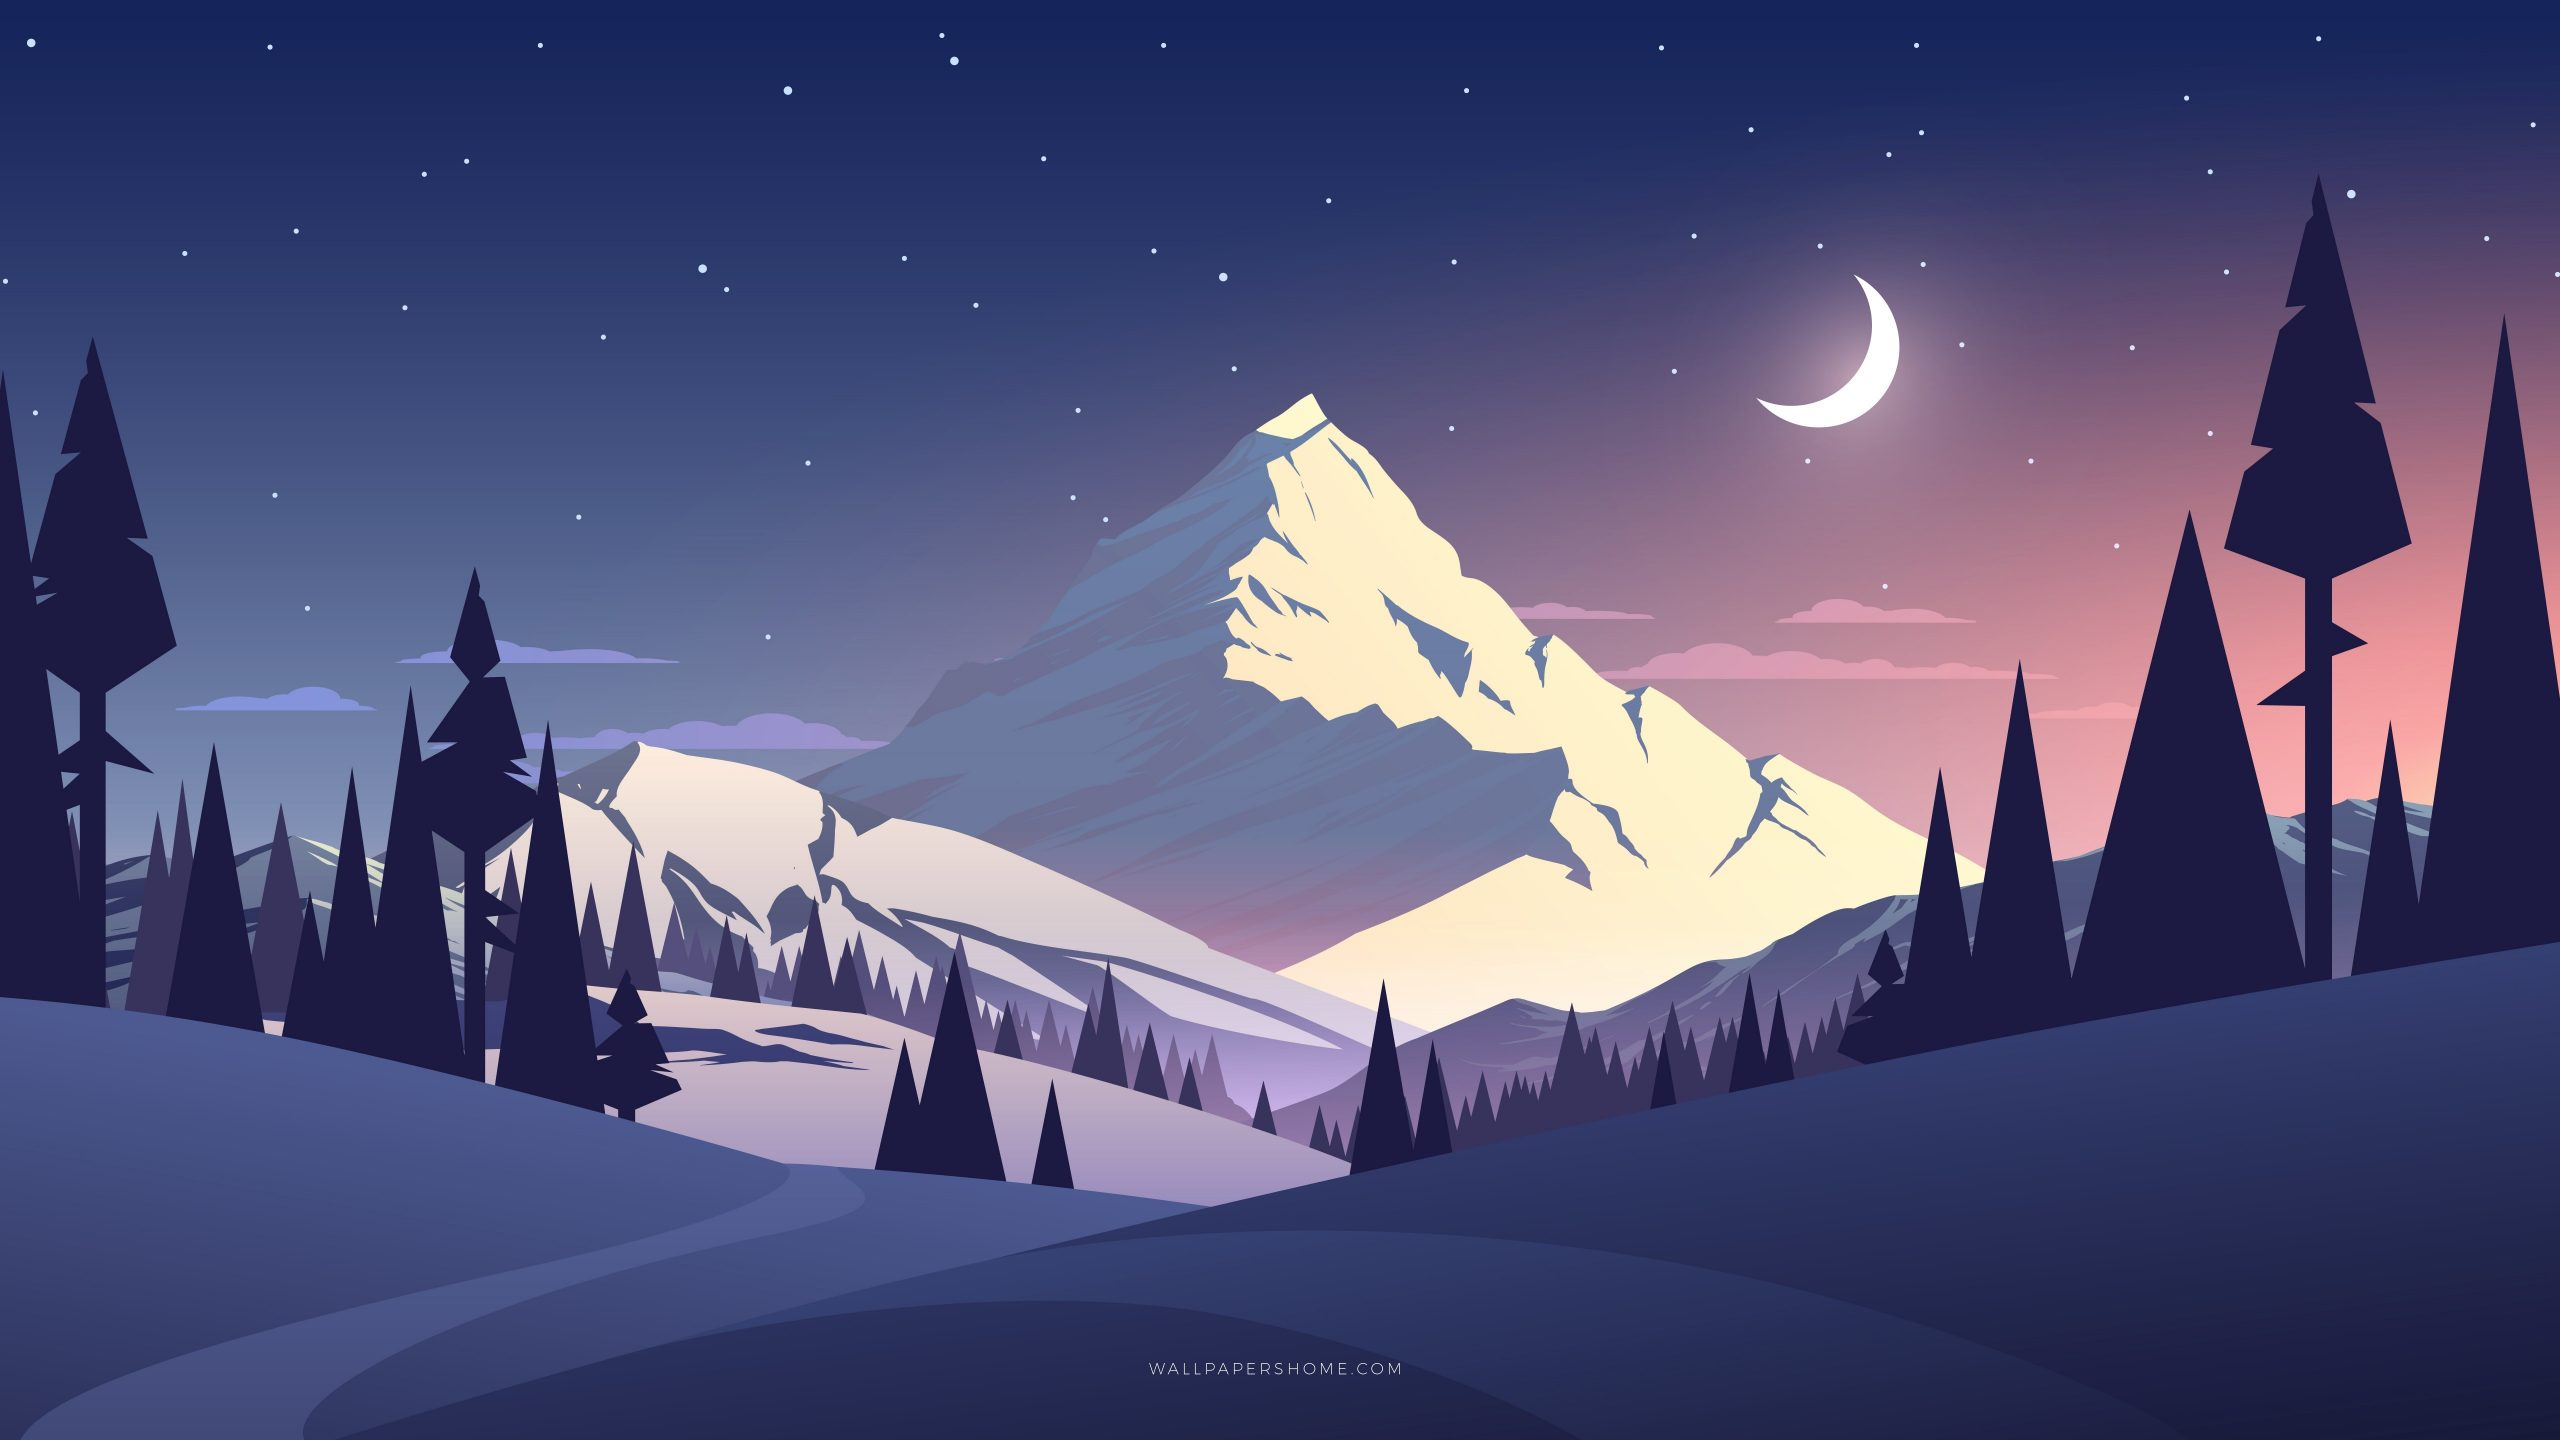 Moon And Mountain Art Wallpaper